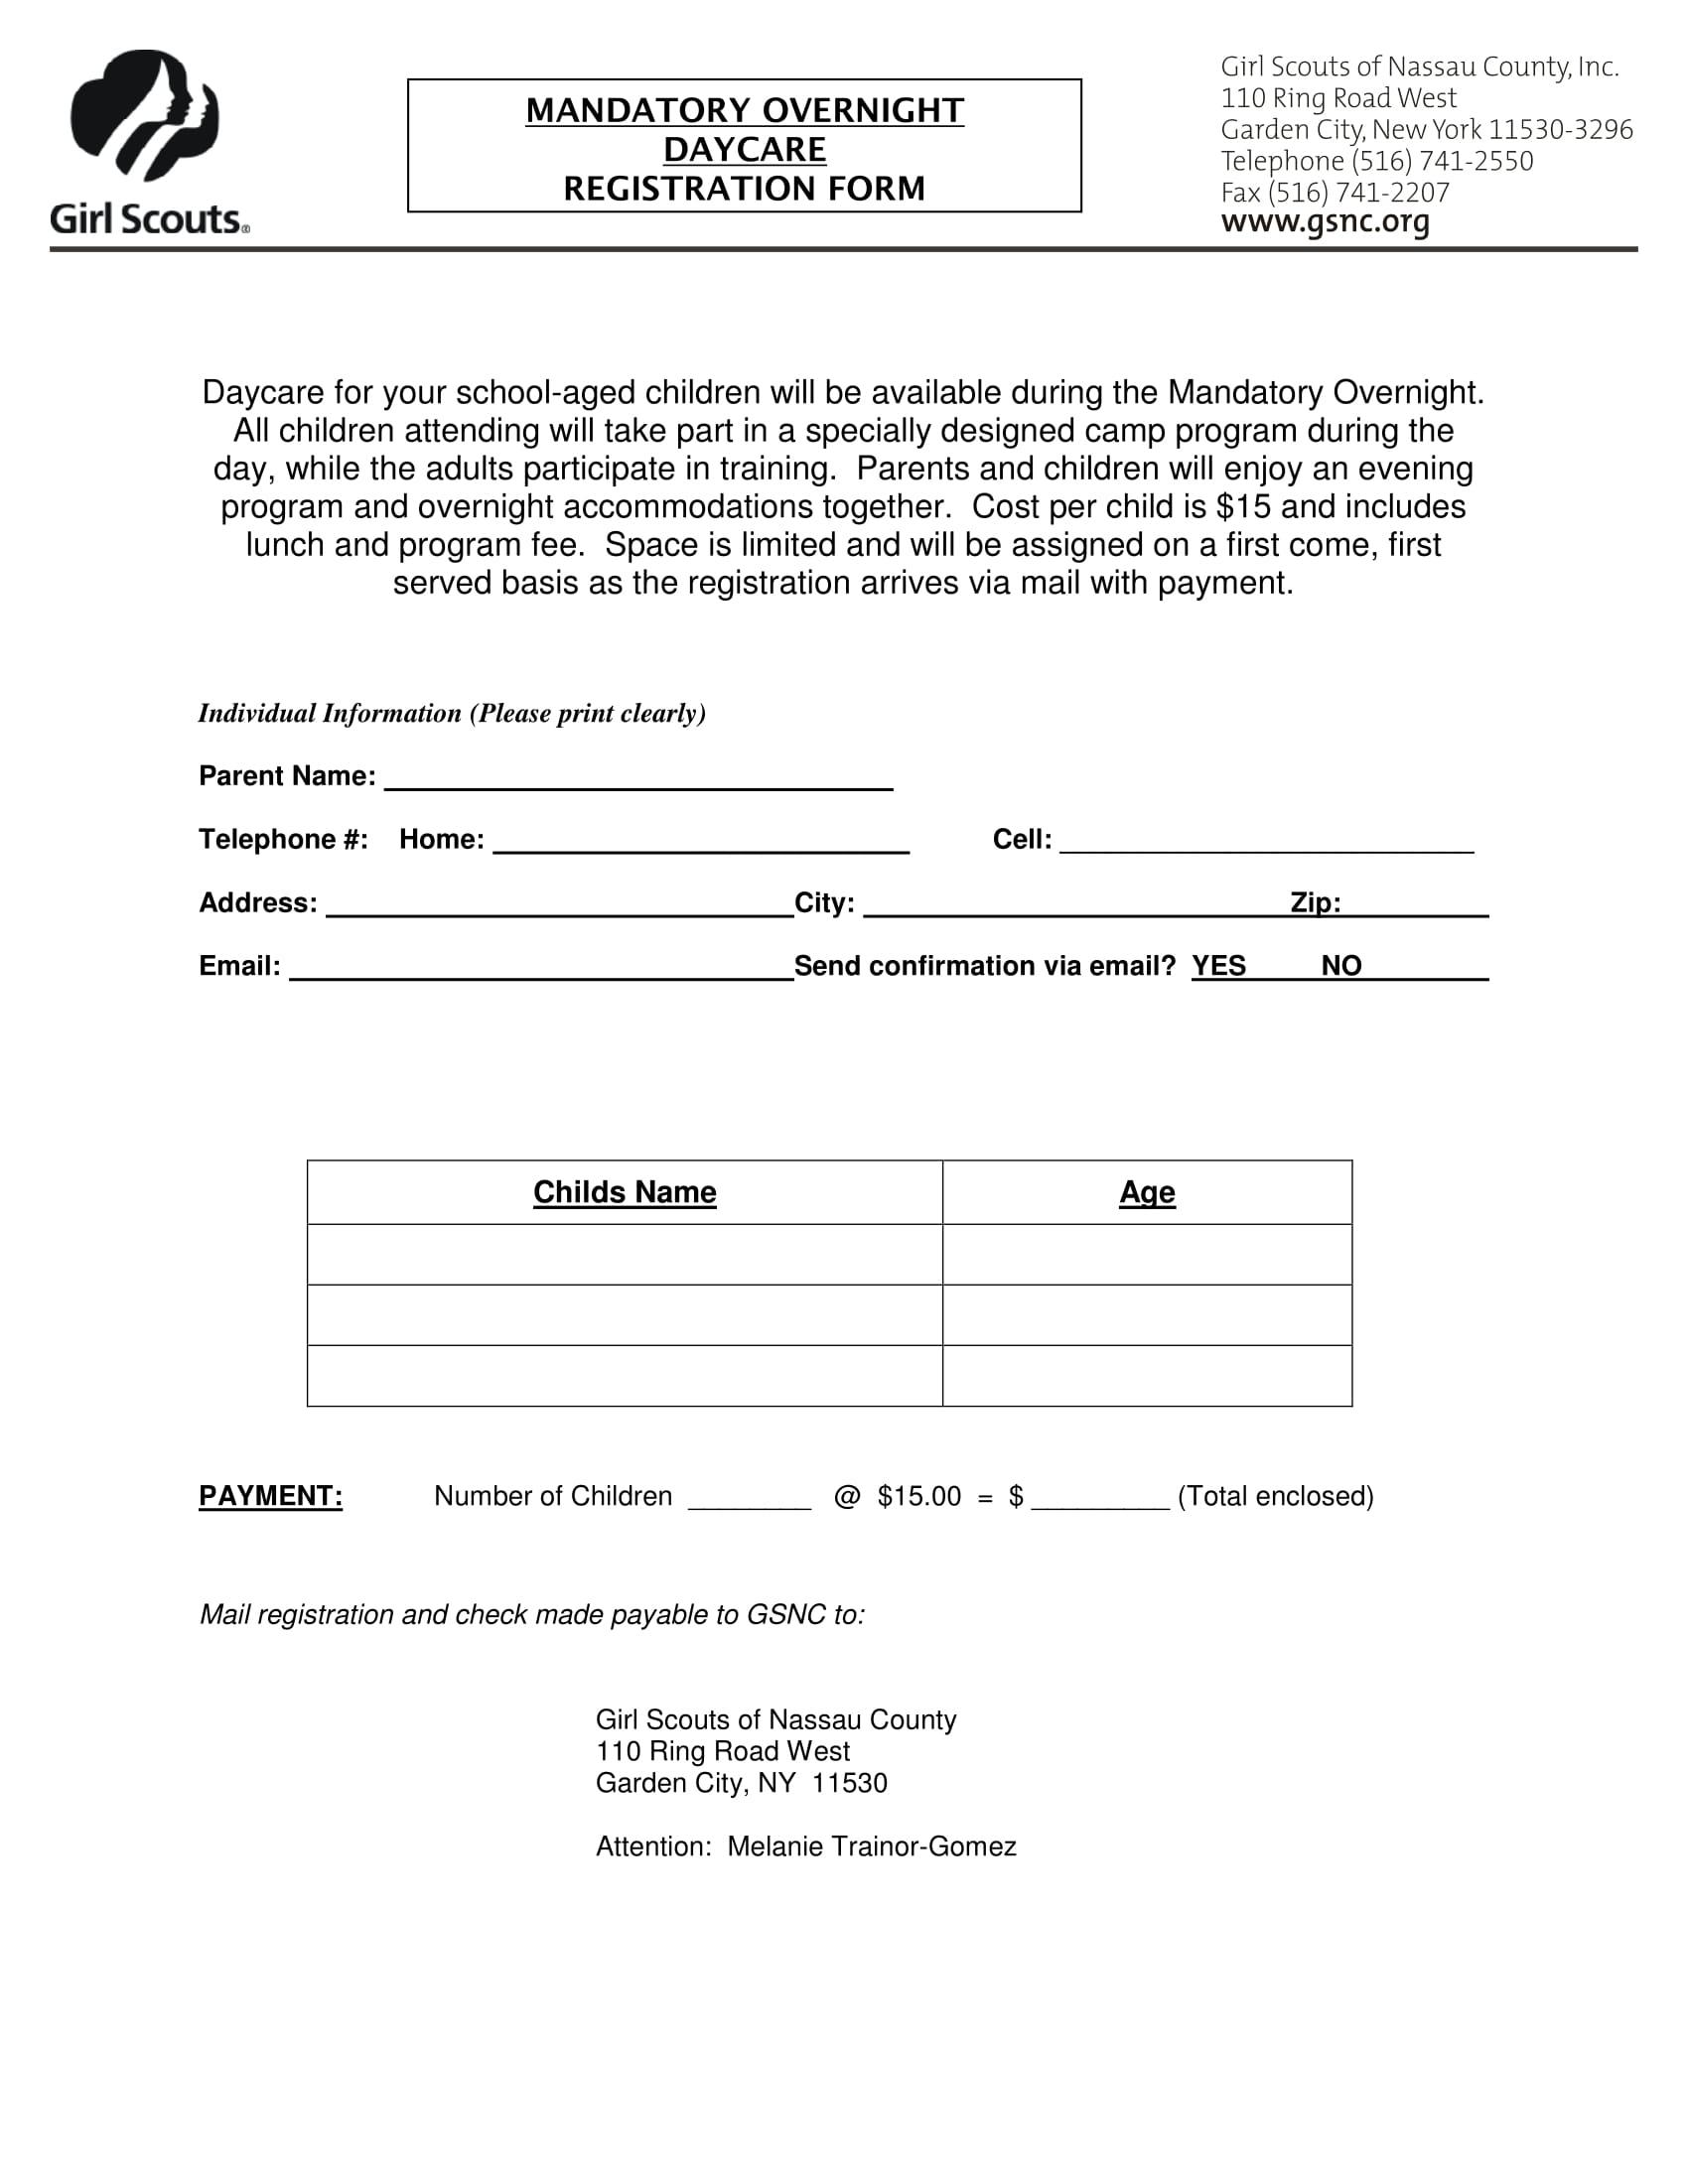 overnight daycare registration form 1